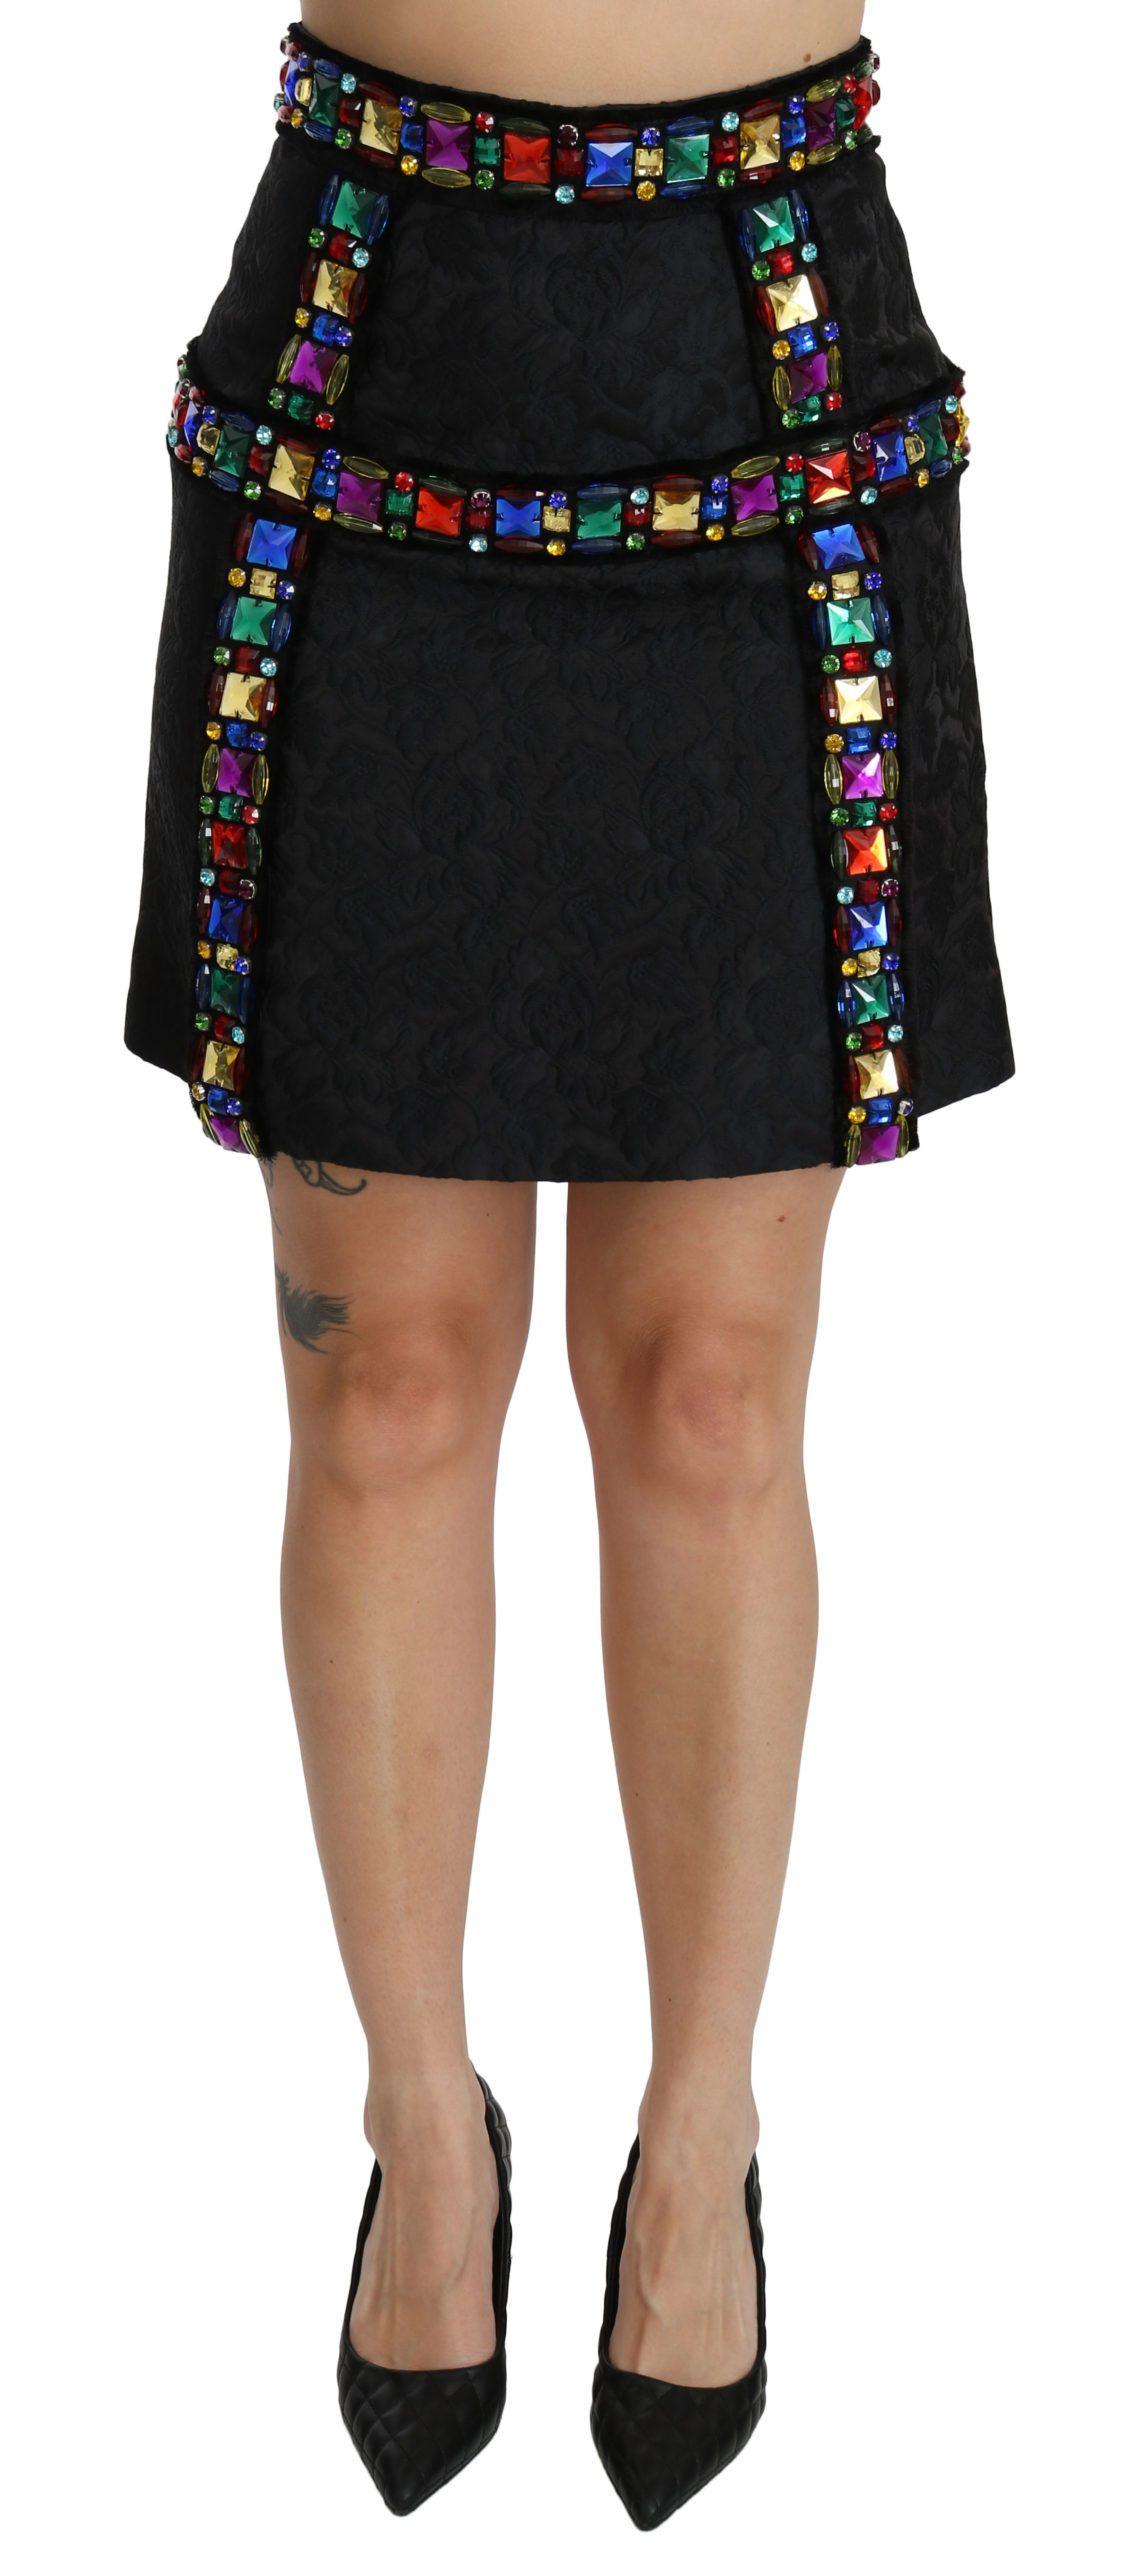 Dolce & Gabbana Women's Crystal Embellished Waist Skirt Black SKI1357 - IT38|XS